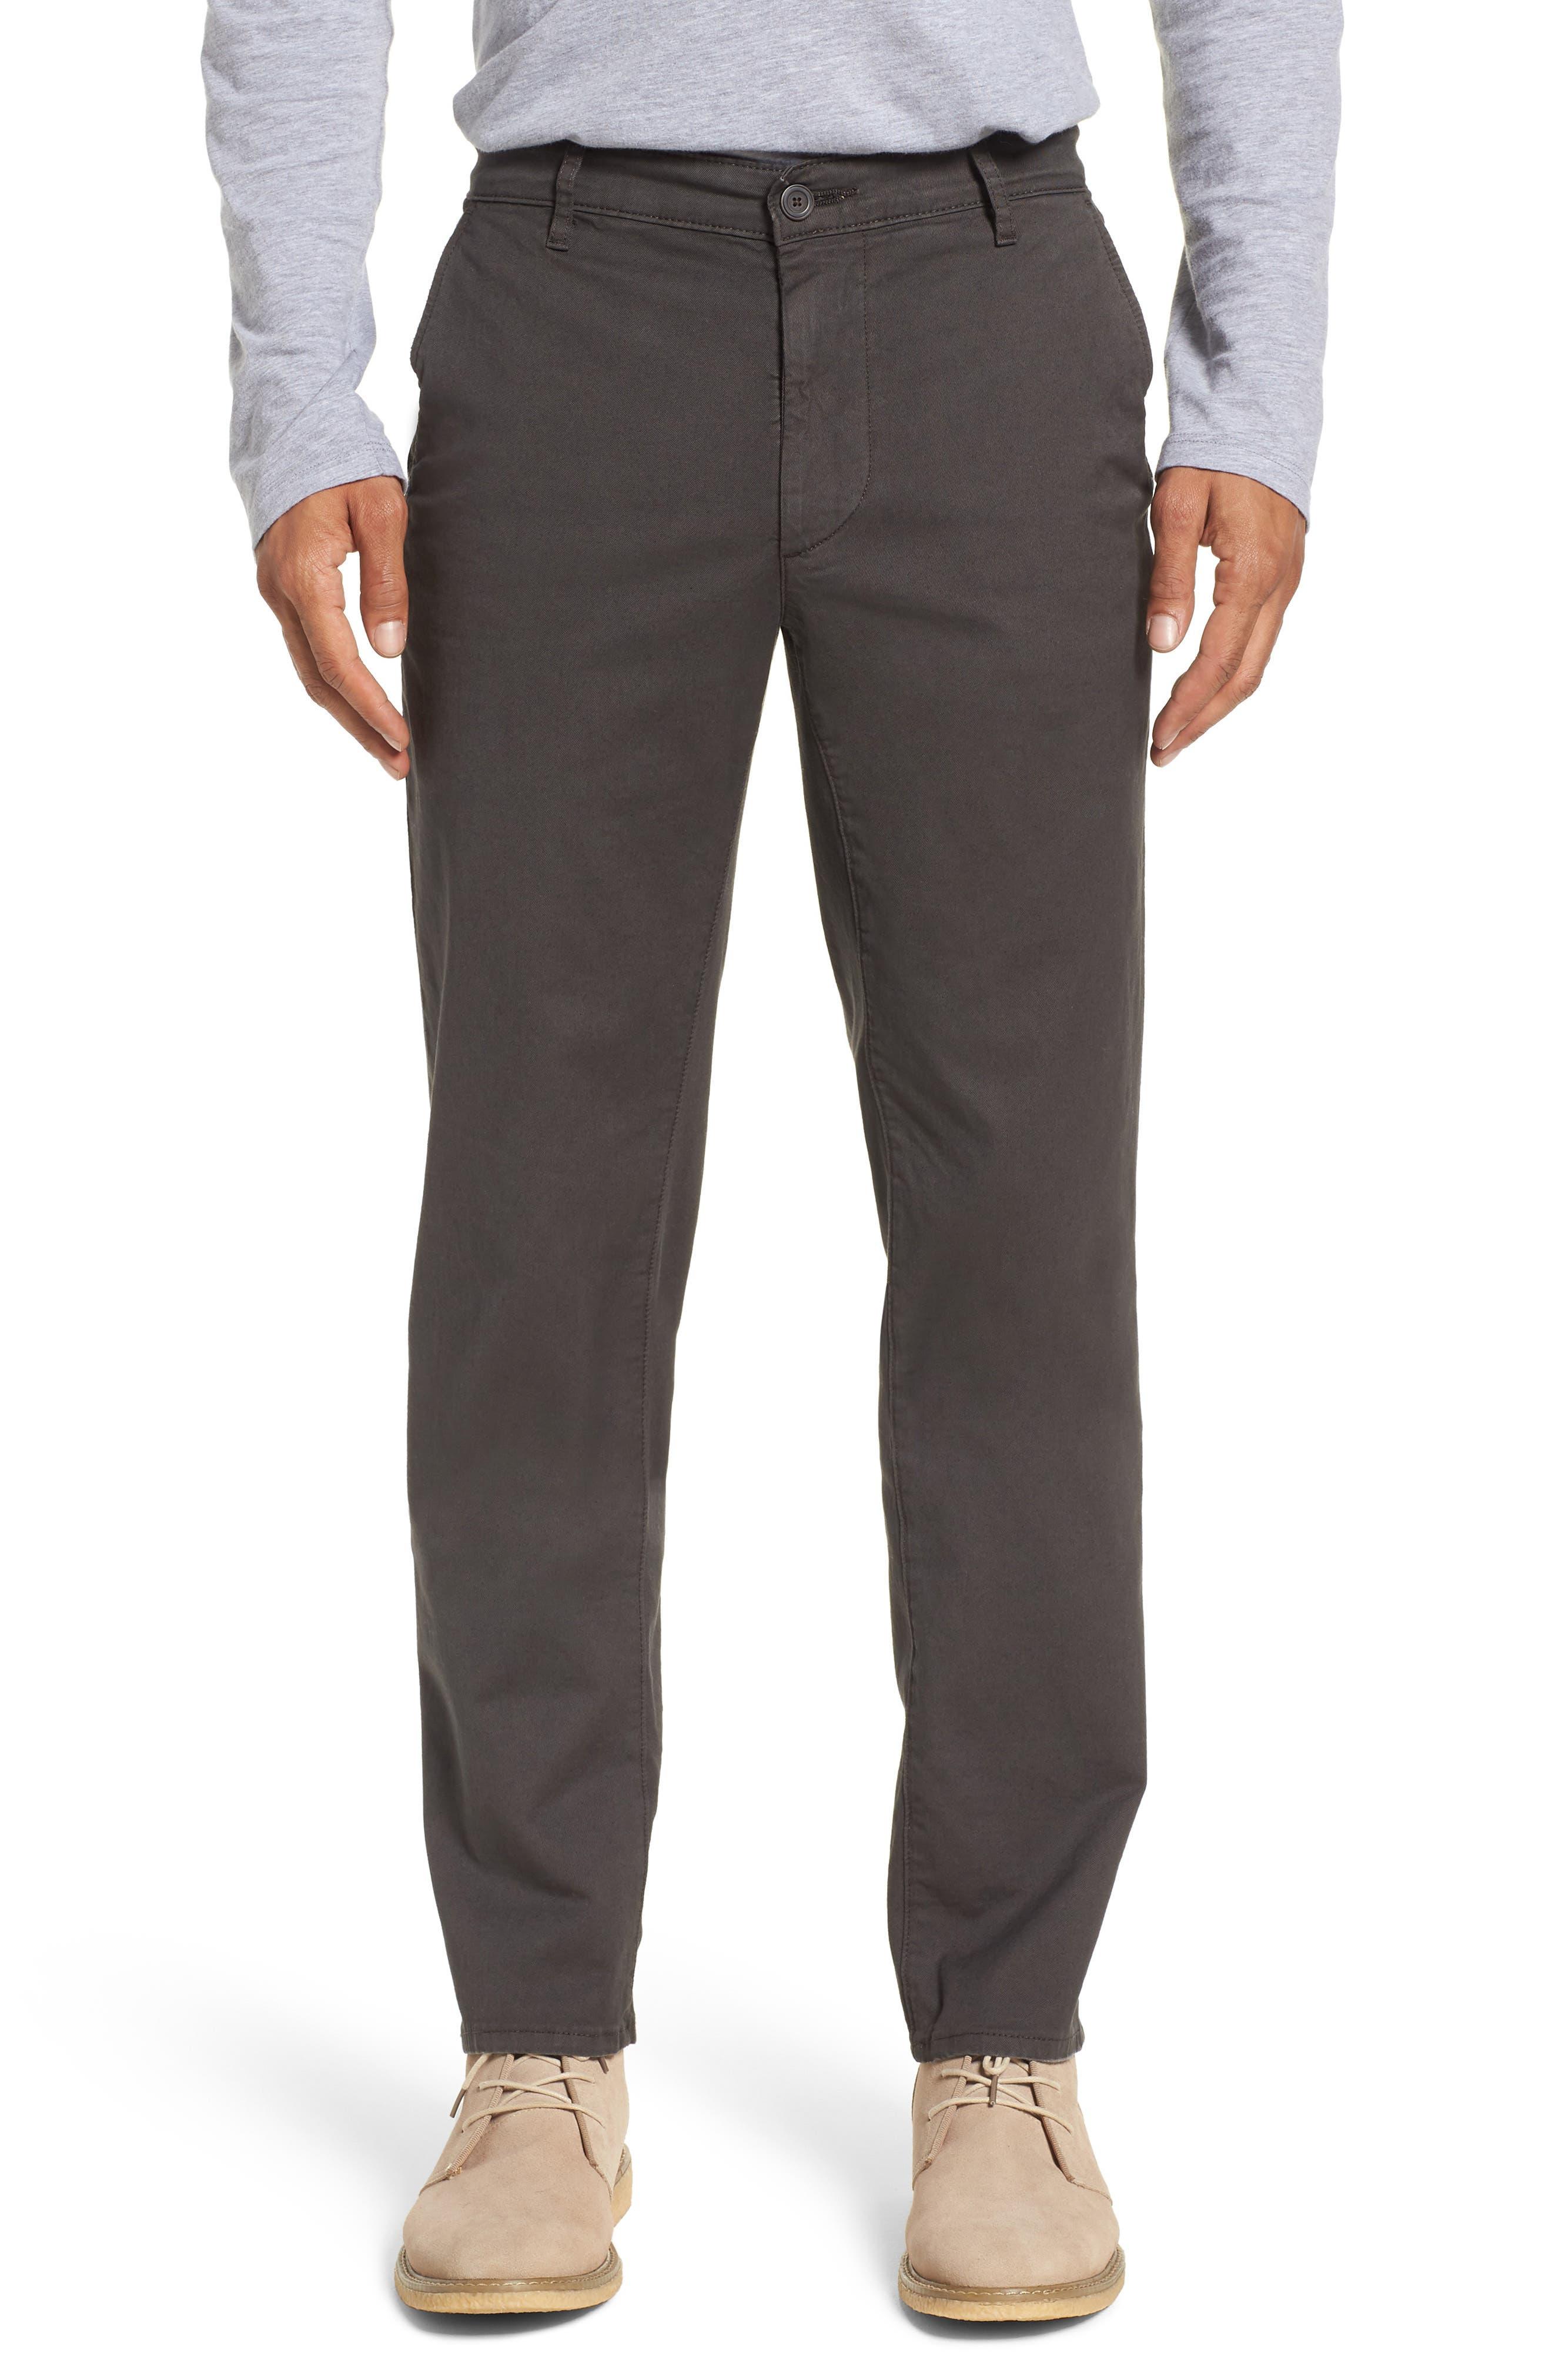 Marshall Slim Straight Leg Chino Pants,                         Main,                         color, 039